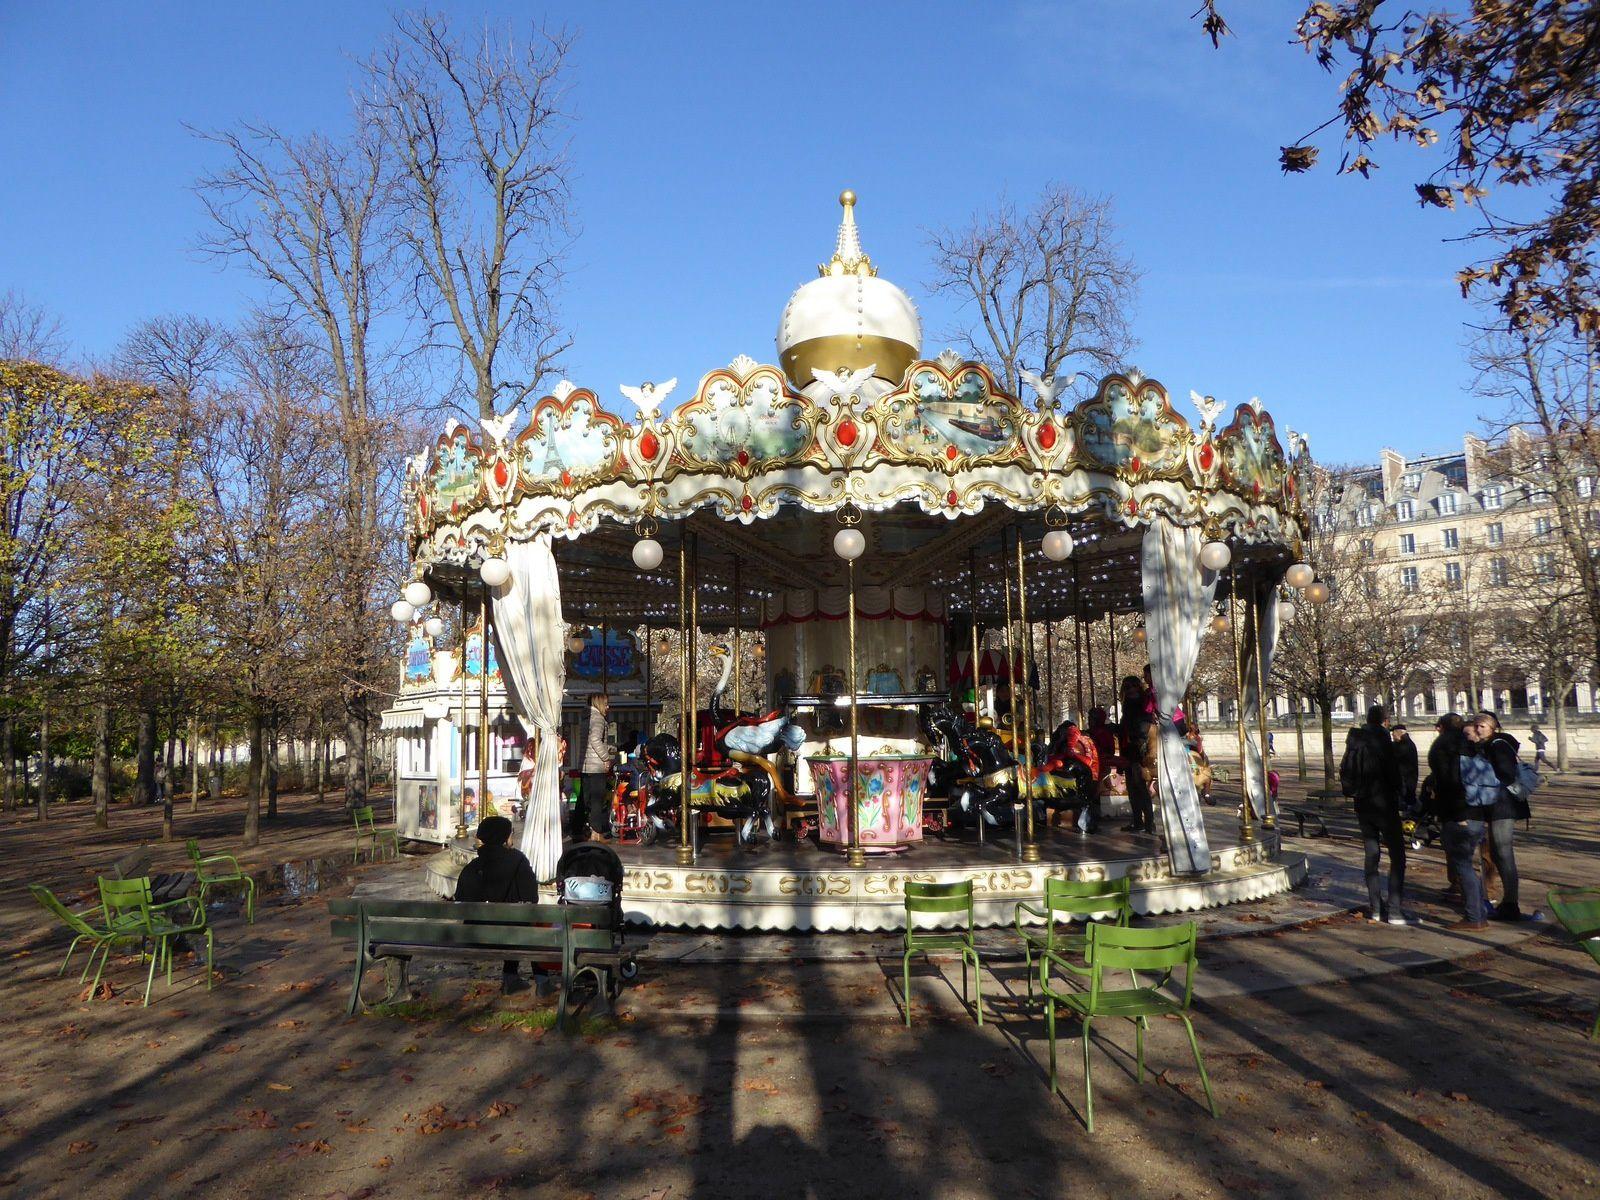 Promenade à Paris automne 2015. 2/..